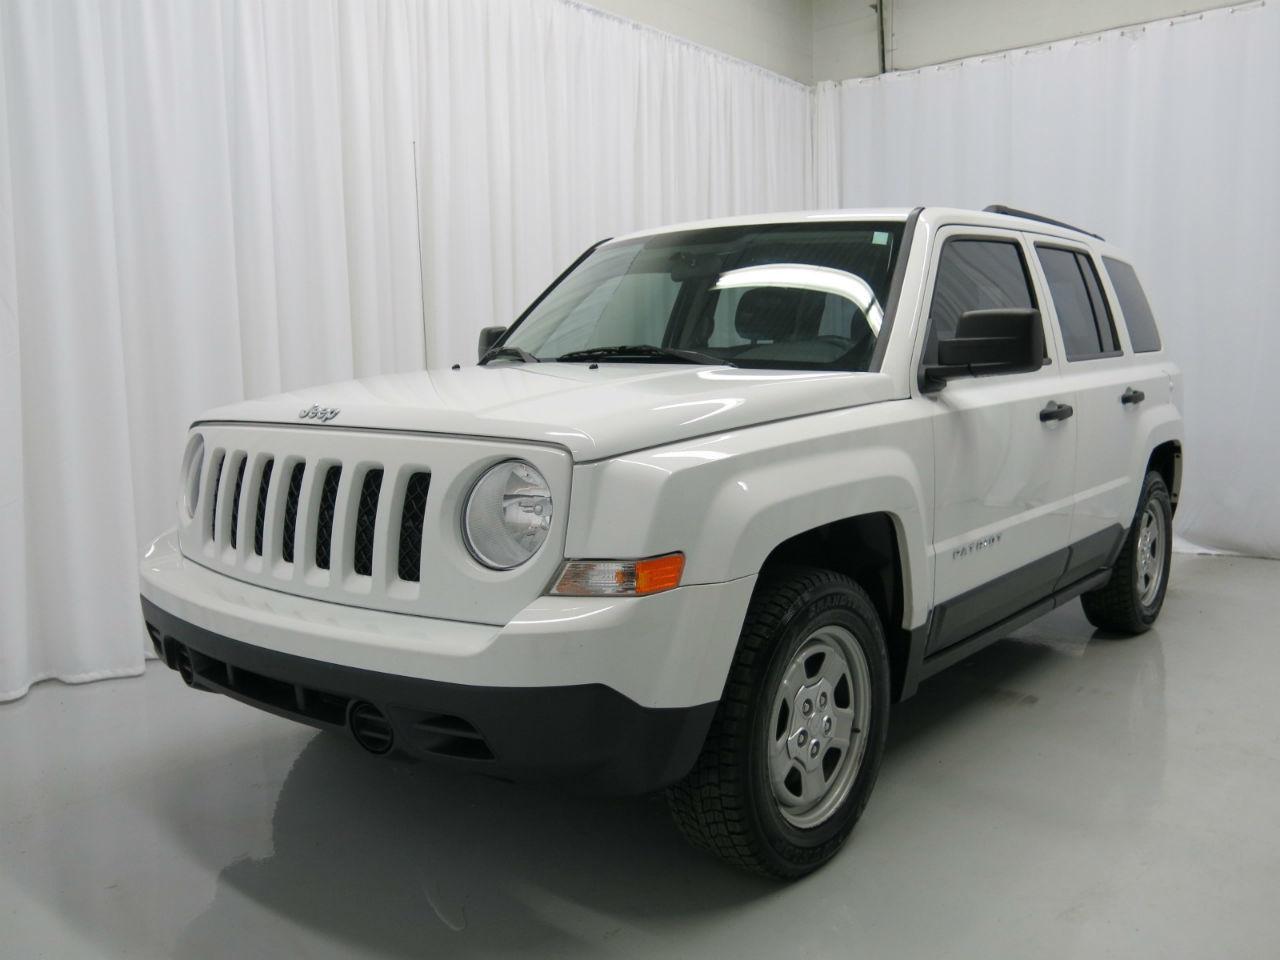 jeep patriot 2011 north d 39 occasion vendu montr al lasalle ford. Black Bedroom Furniture Sets. Home Design Ideas